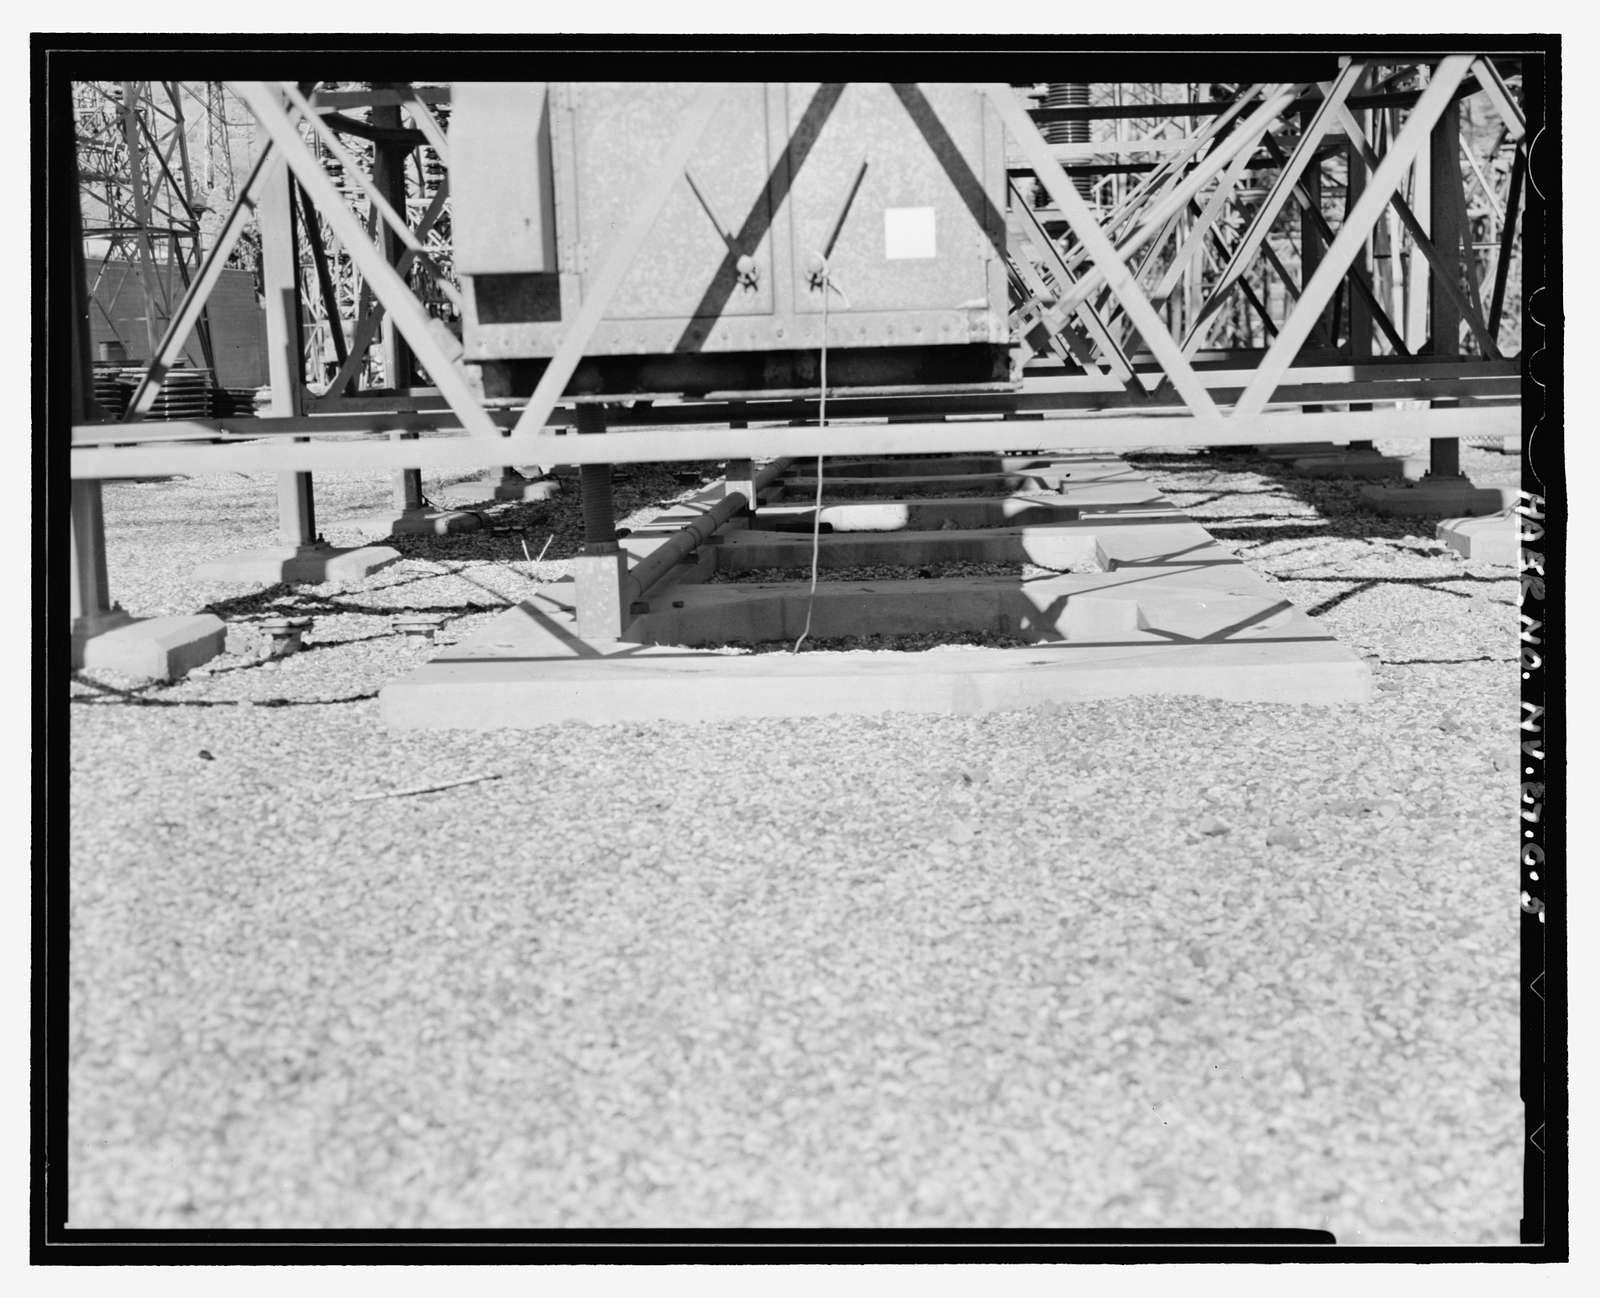 Hoover Dam, Metropolitan Water District Switchyard, U.S. Highway 93, Boulder City, Clark County, NV